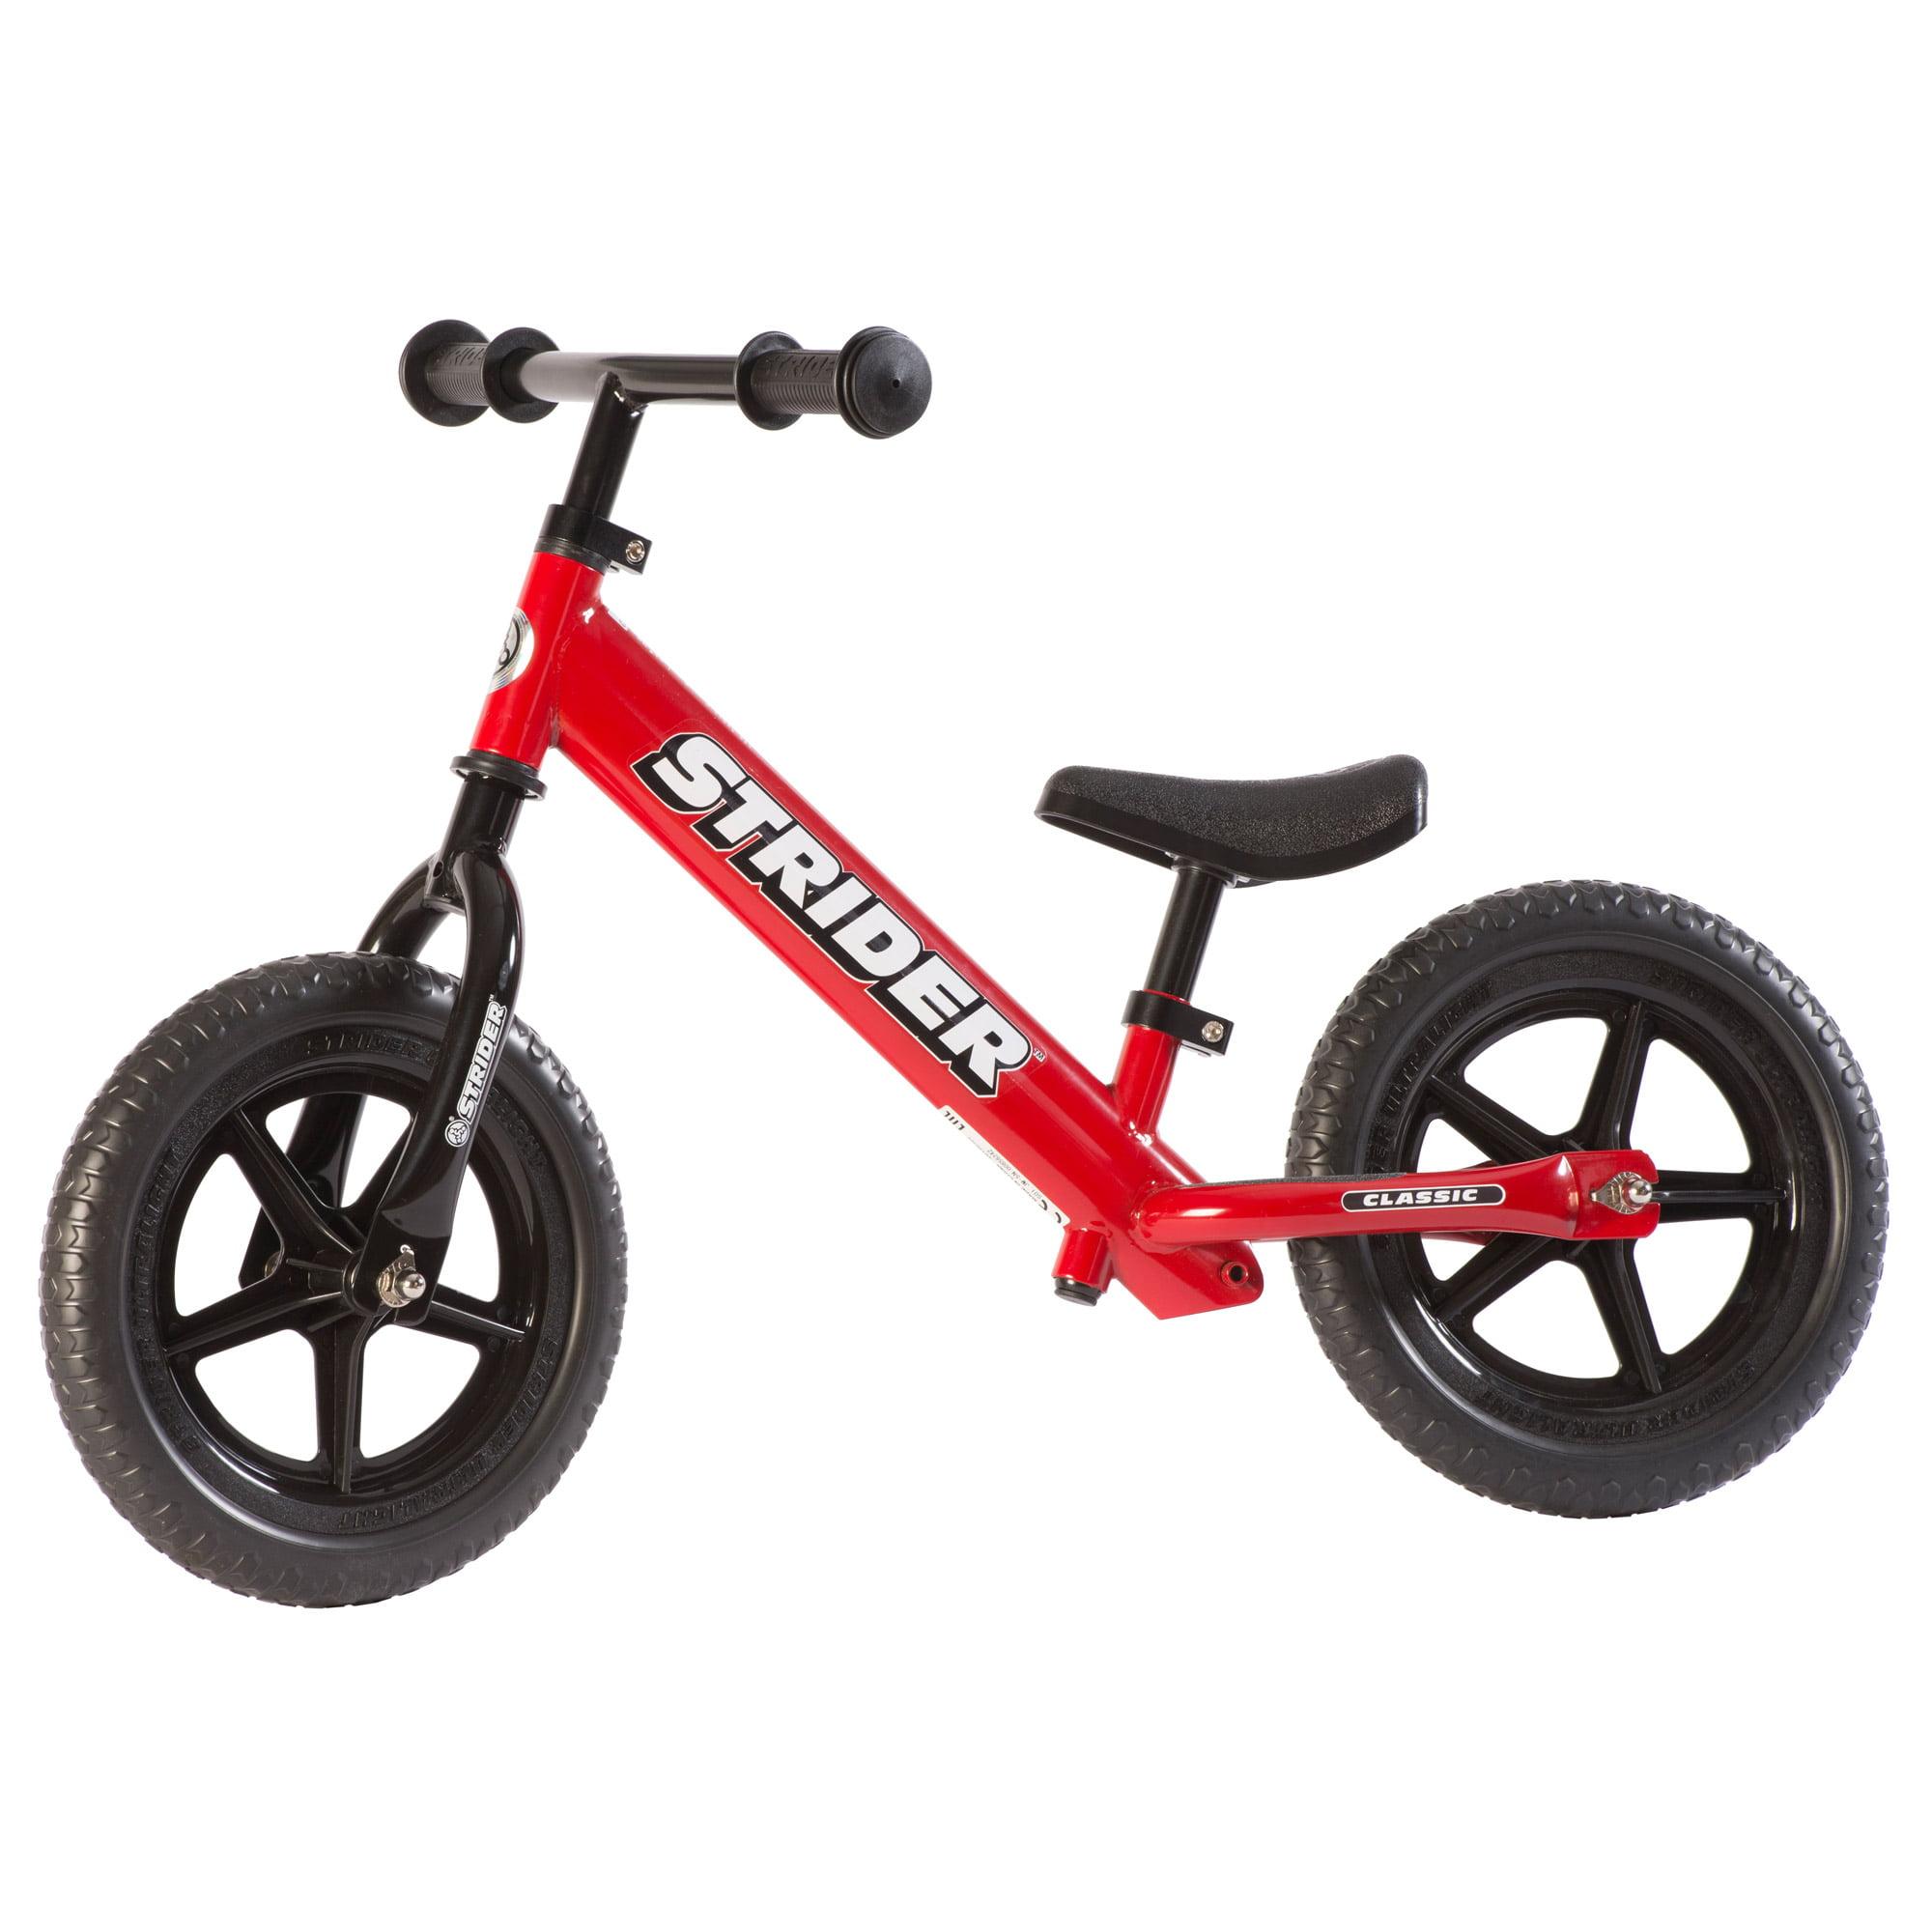 STRIDER 12 Classic Balance Bike, Red by Strider